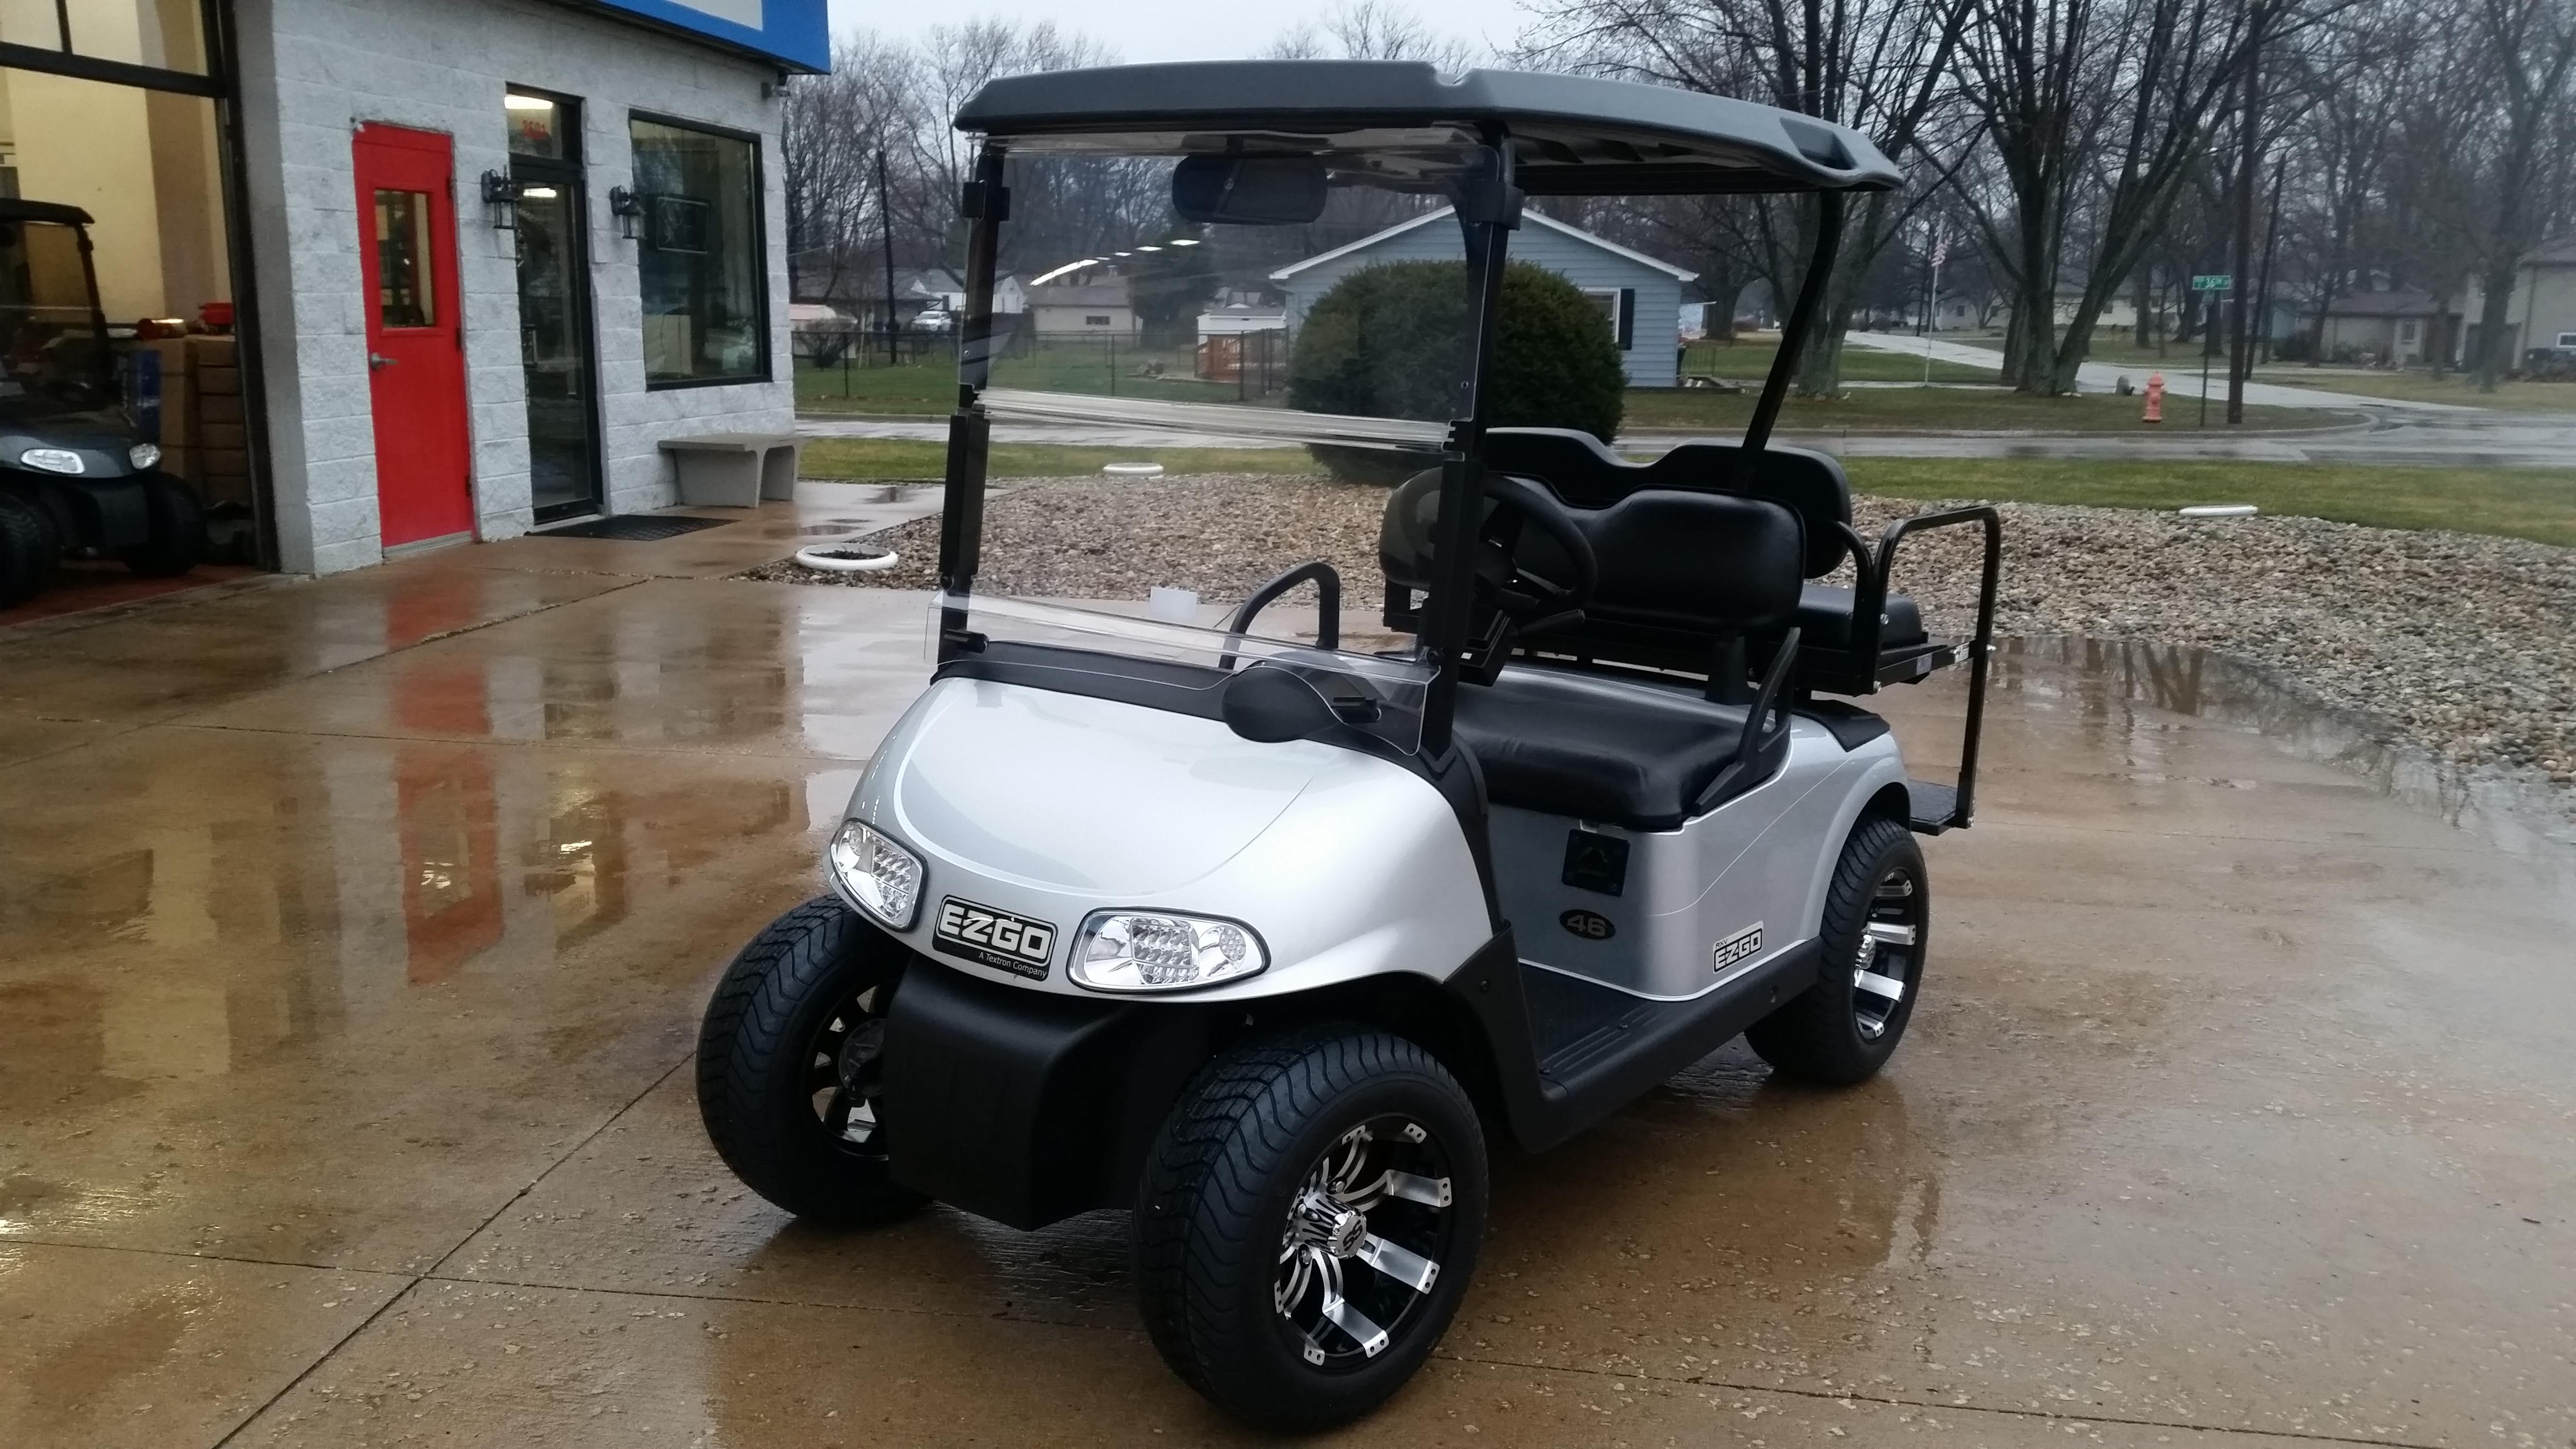 Metalic Silver / Platinum EZ-GO RXV - eXpress Custom Carts on custom electric golf carts, custom lifted golf carts, custom golf carts california, tricked out custom golf carts, ezgo golf carts, electric club car golf carts,